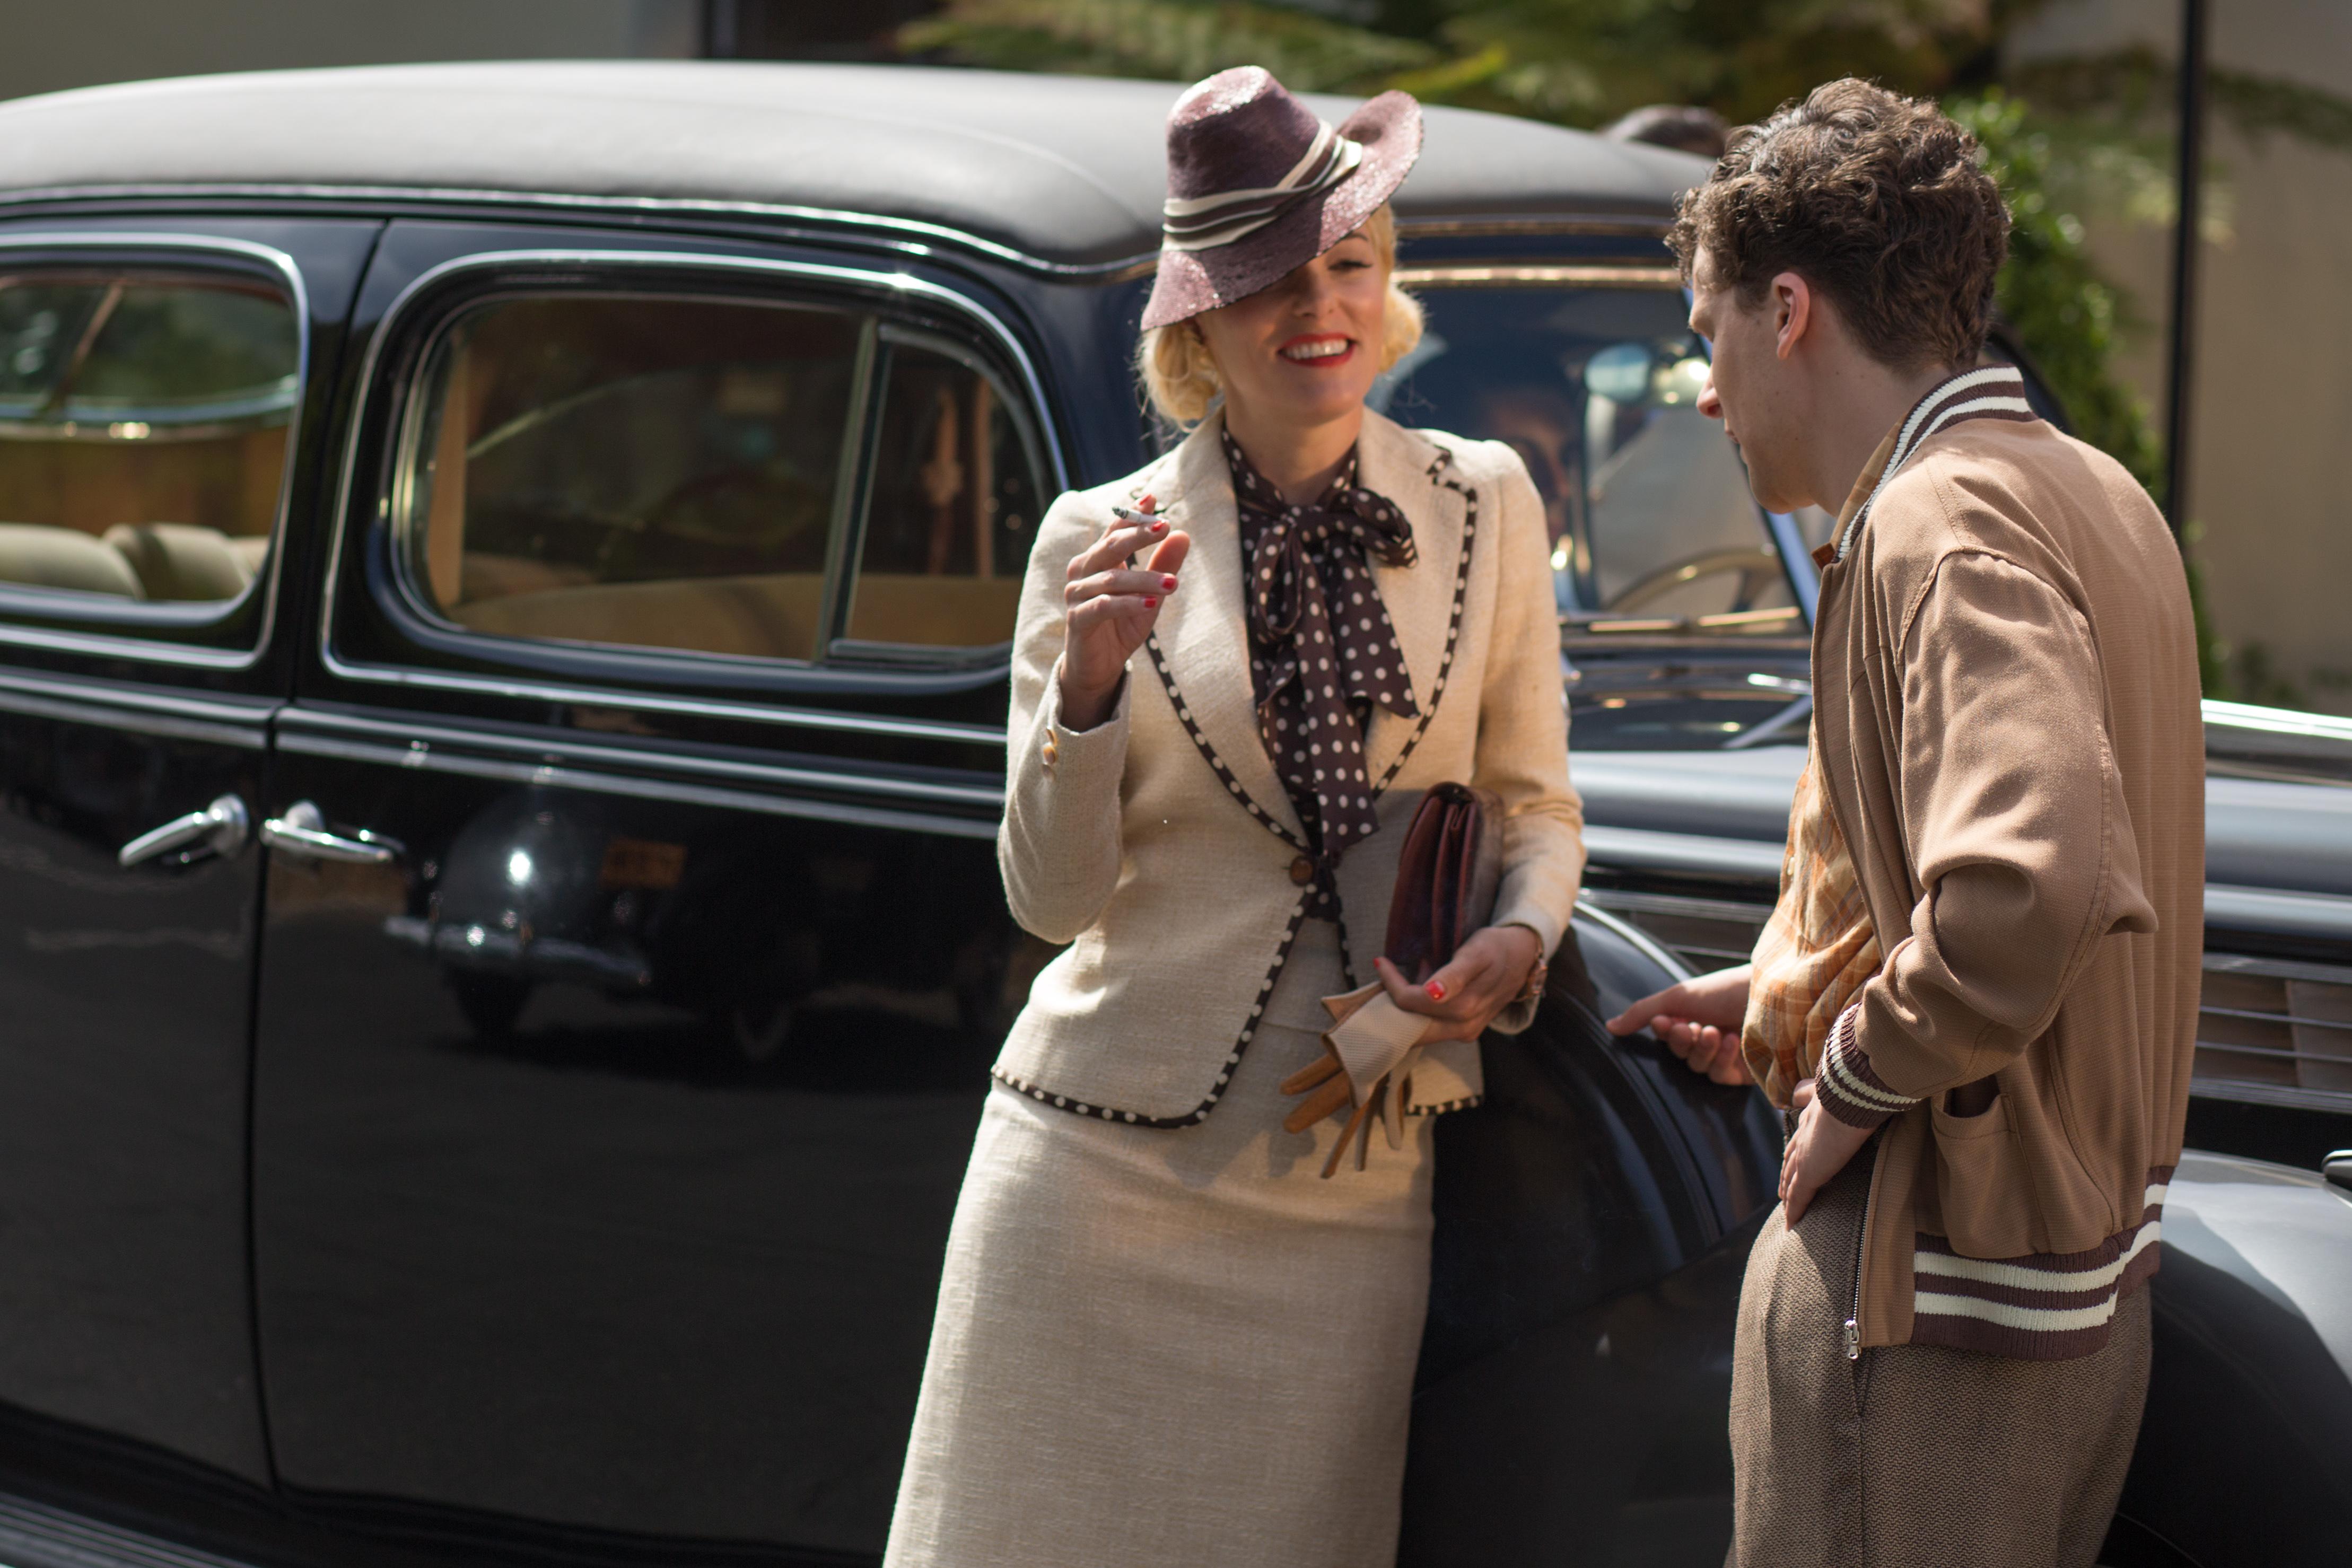 Chanel、Schiaparelli聯手加持《咖啡‧愛情》_戲服設計師Suzy_Benzinger重現1930年代Café_Society絕美風華12.jpg